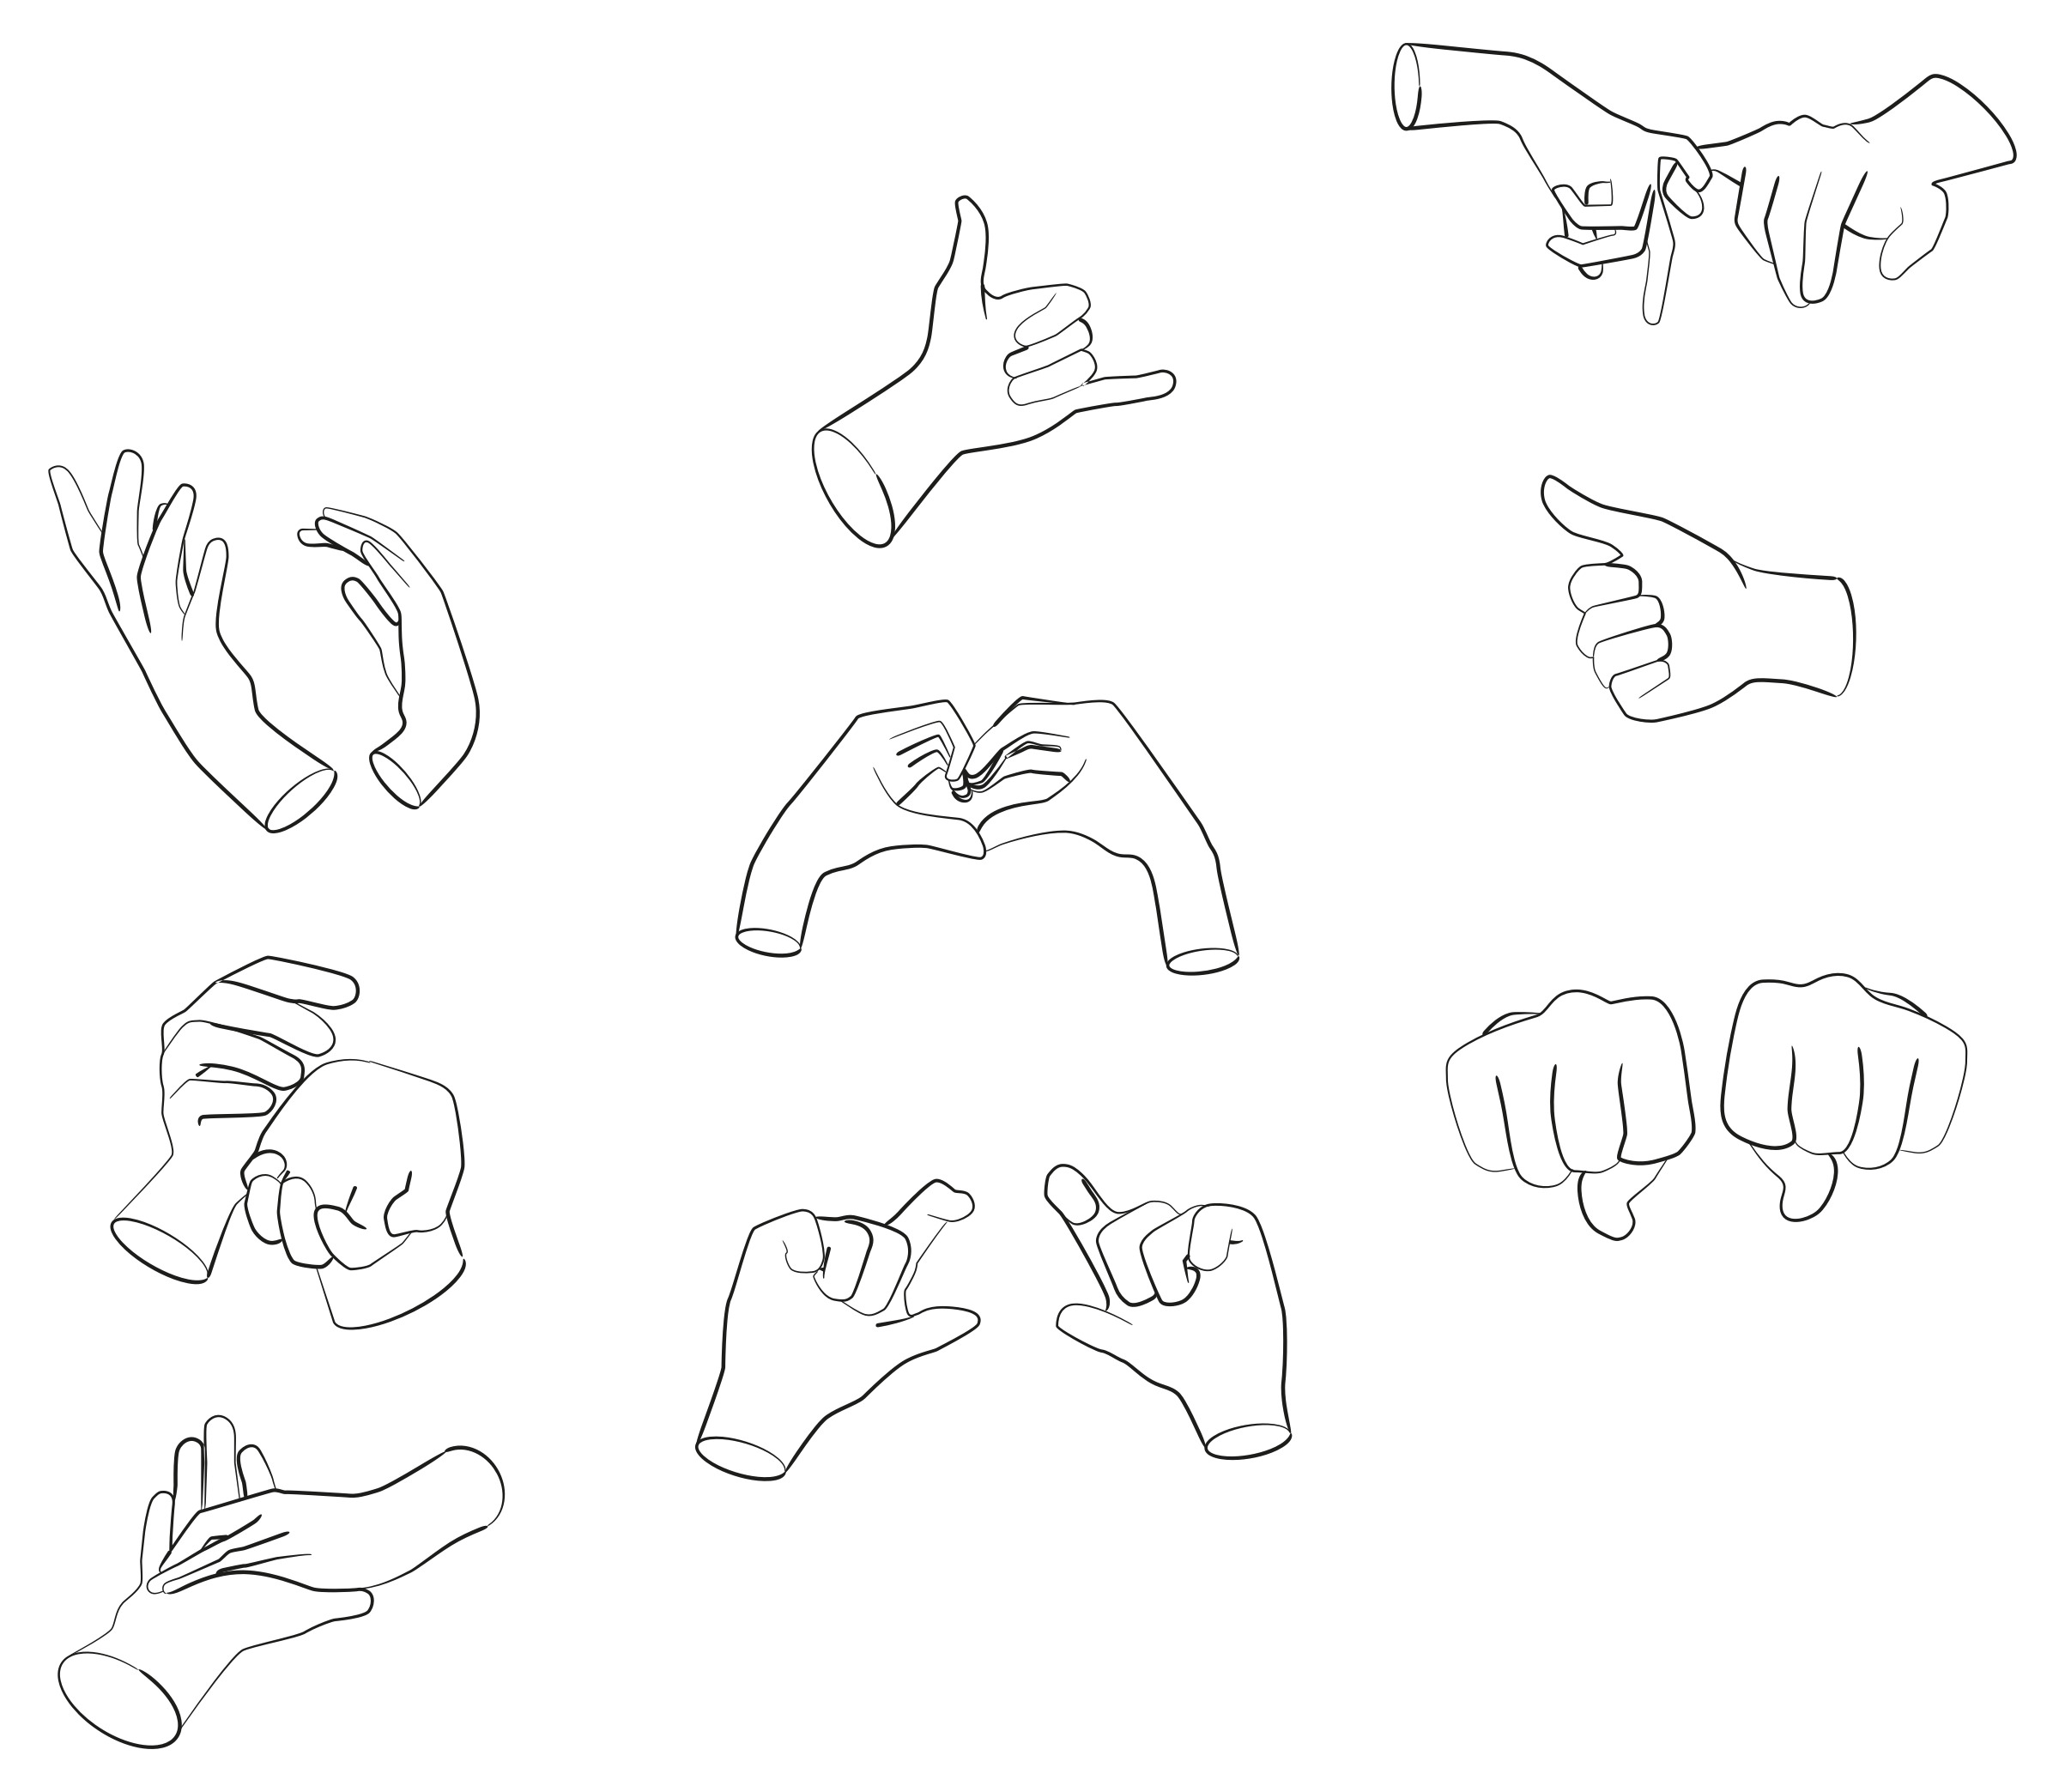 Iconography.jpg